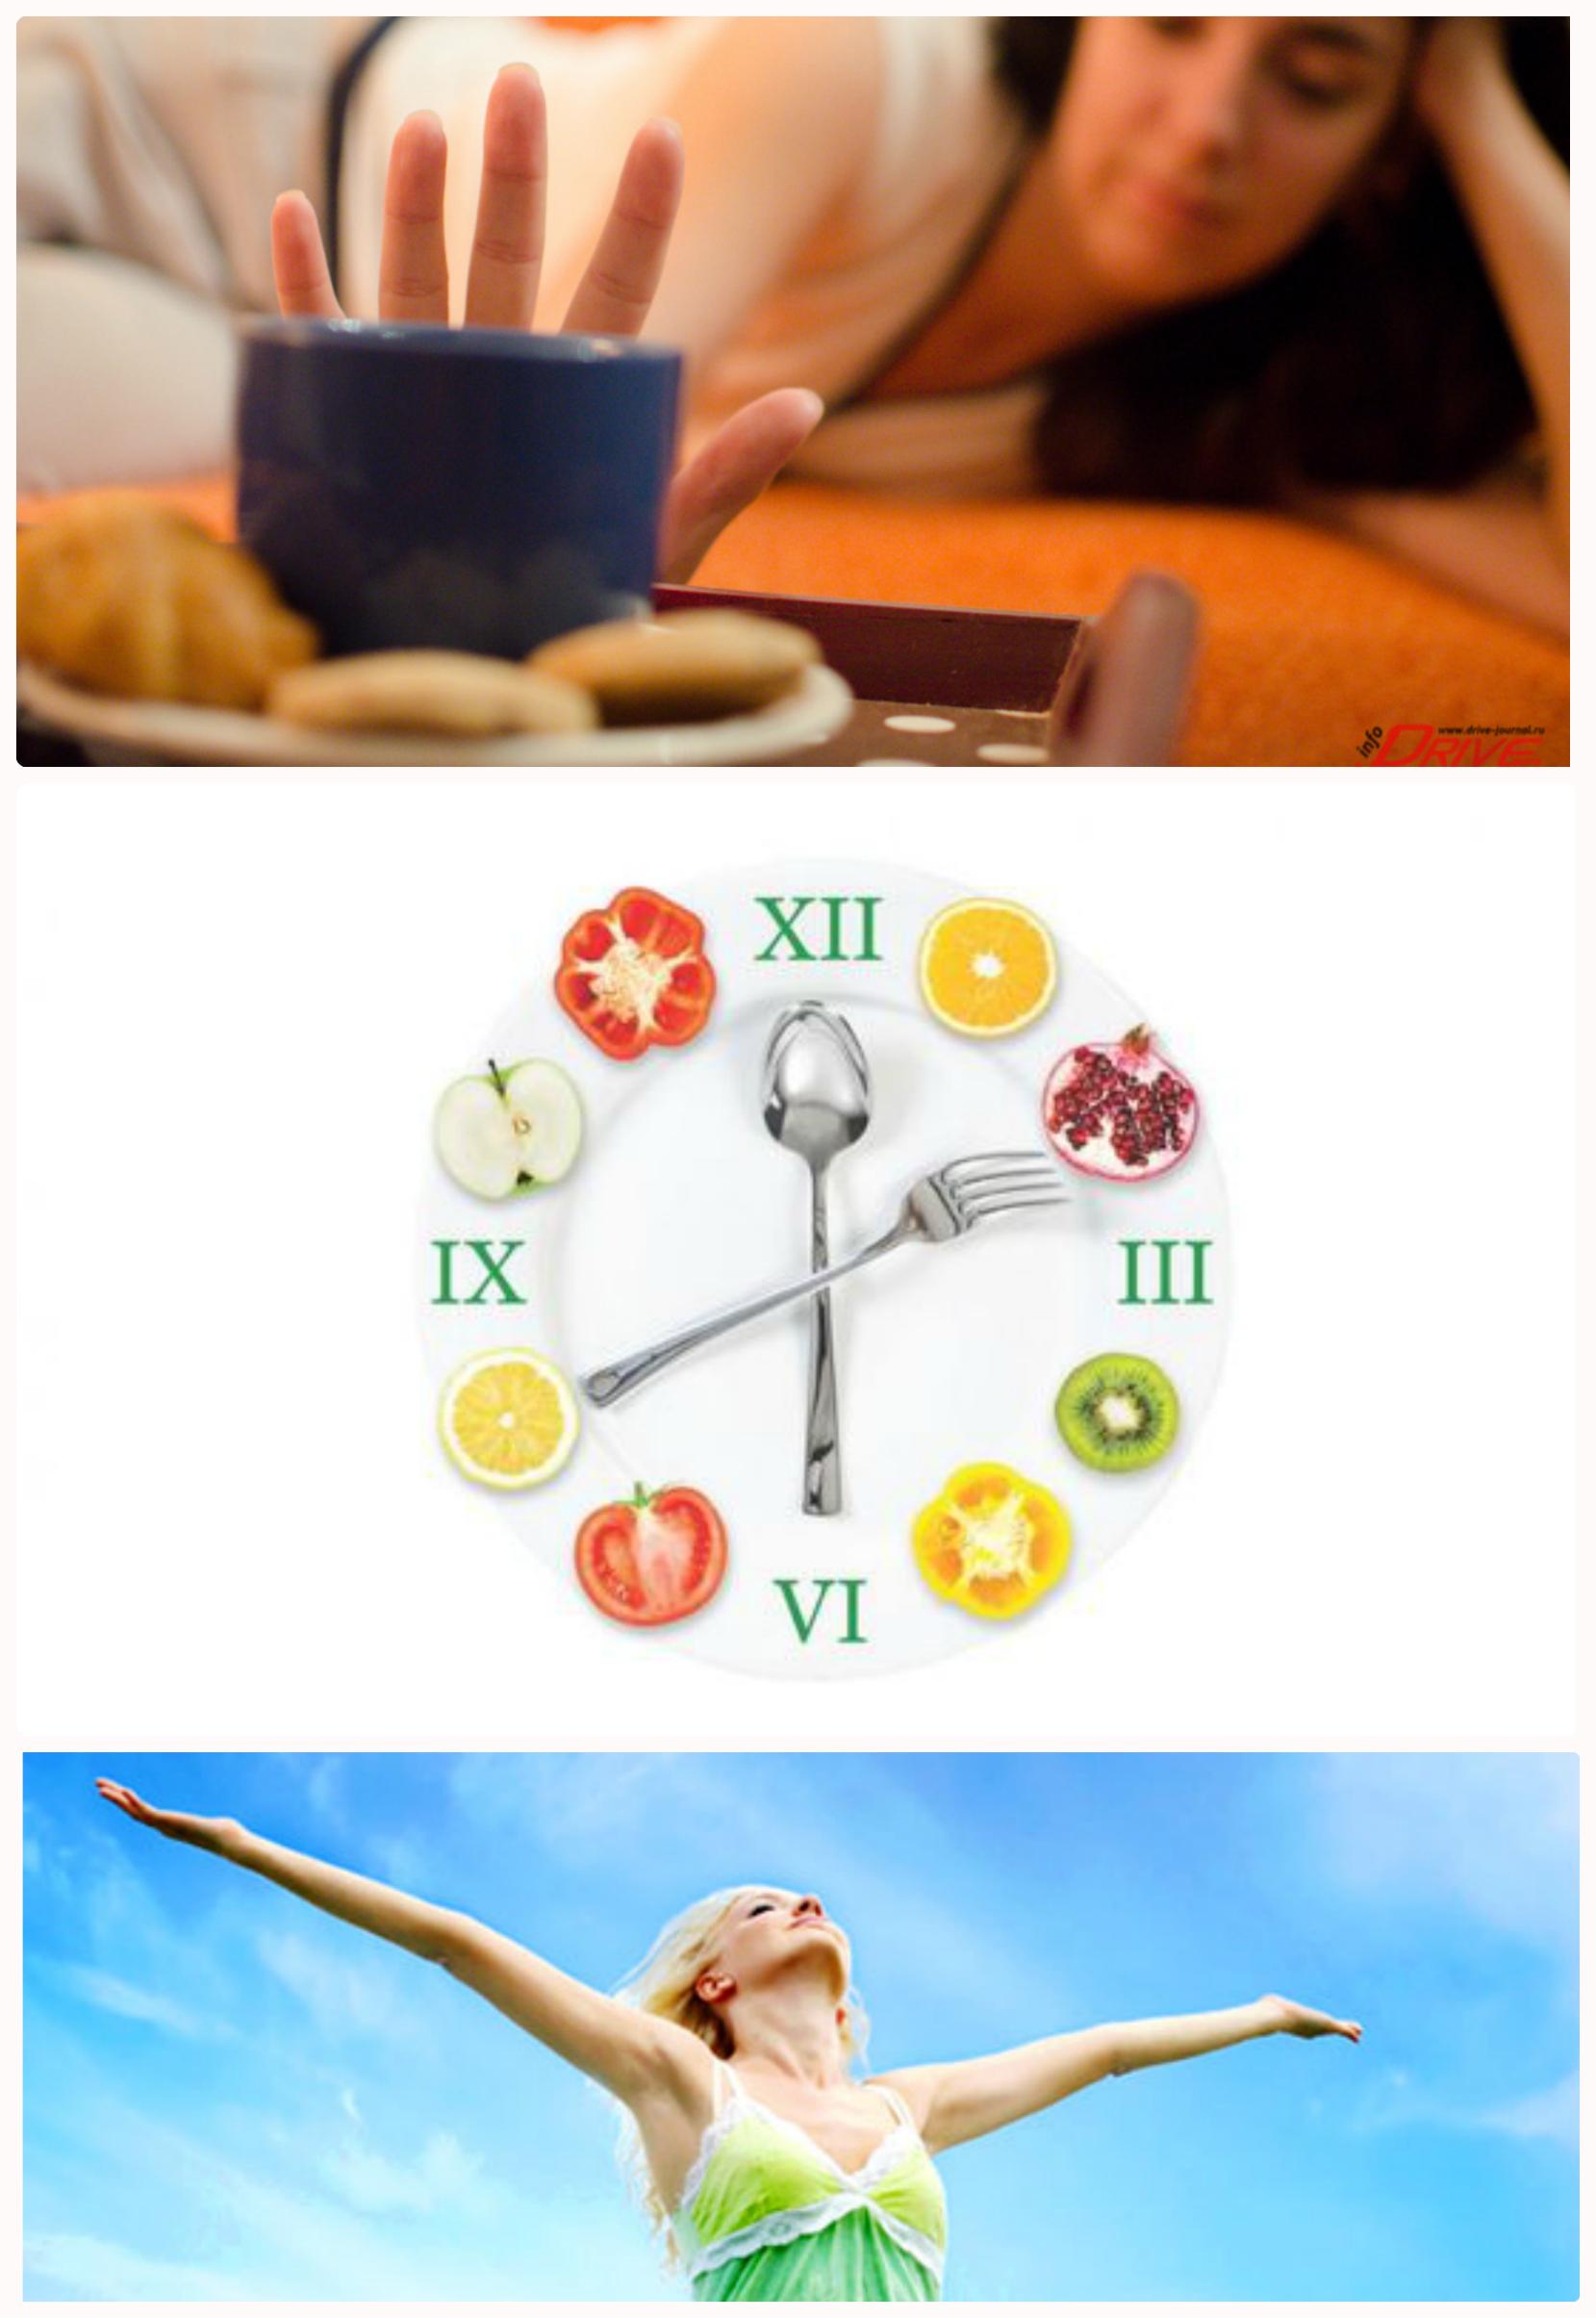 свежий воздух . регулярное питание